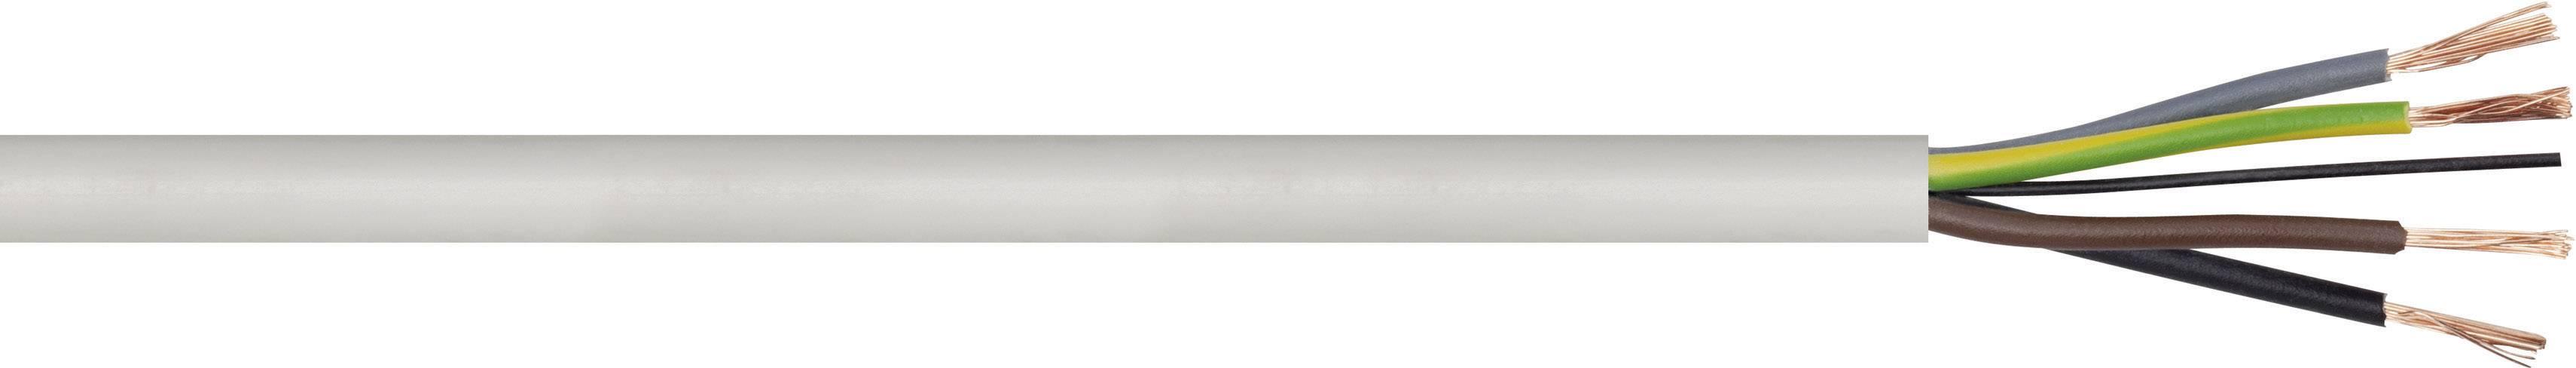 El. kábel hadicový H03VV-F LappKabel 1601211, 4 G 0.75 mm², čierna, metrový tovar